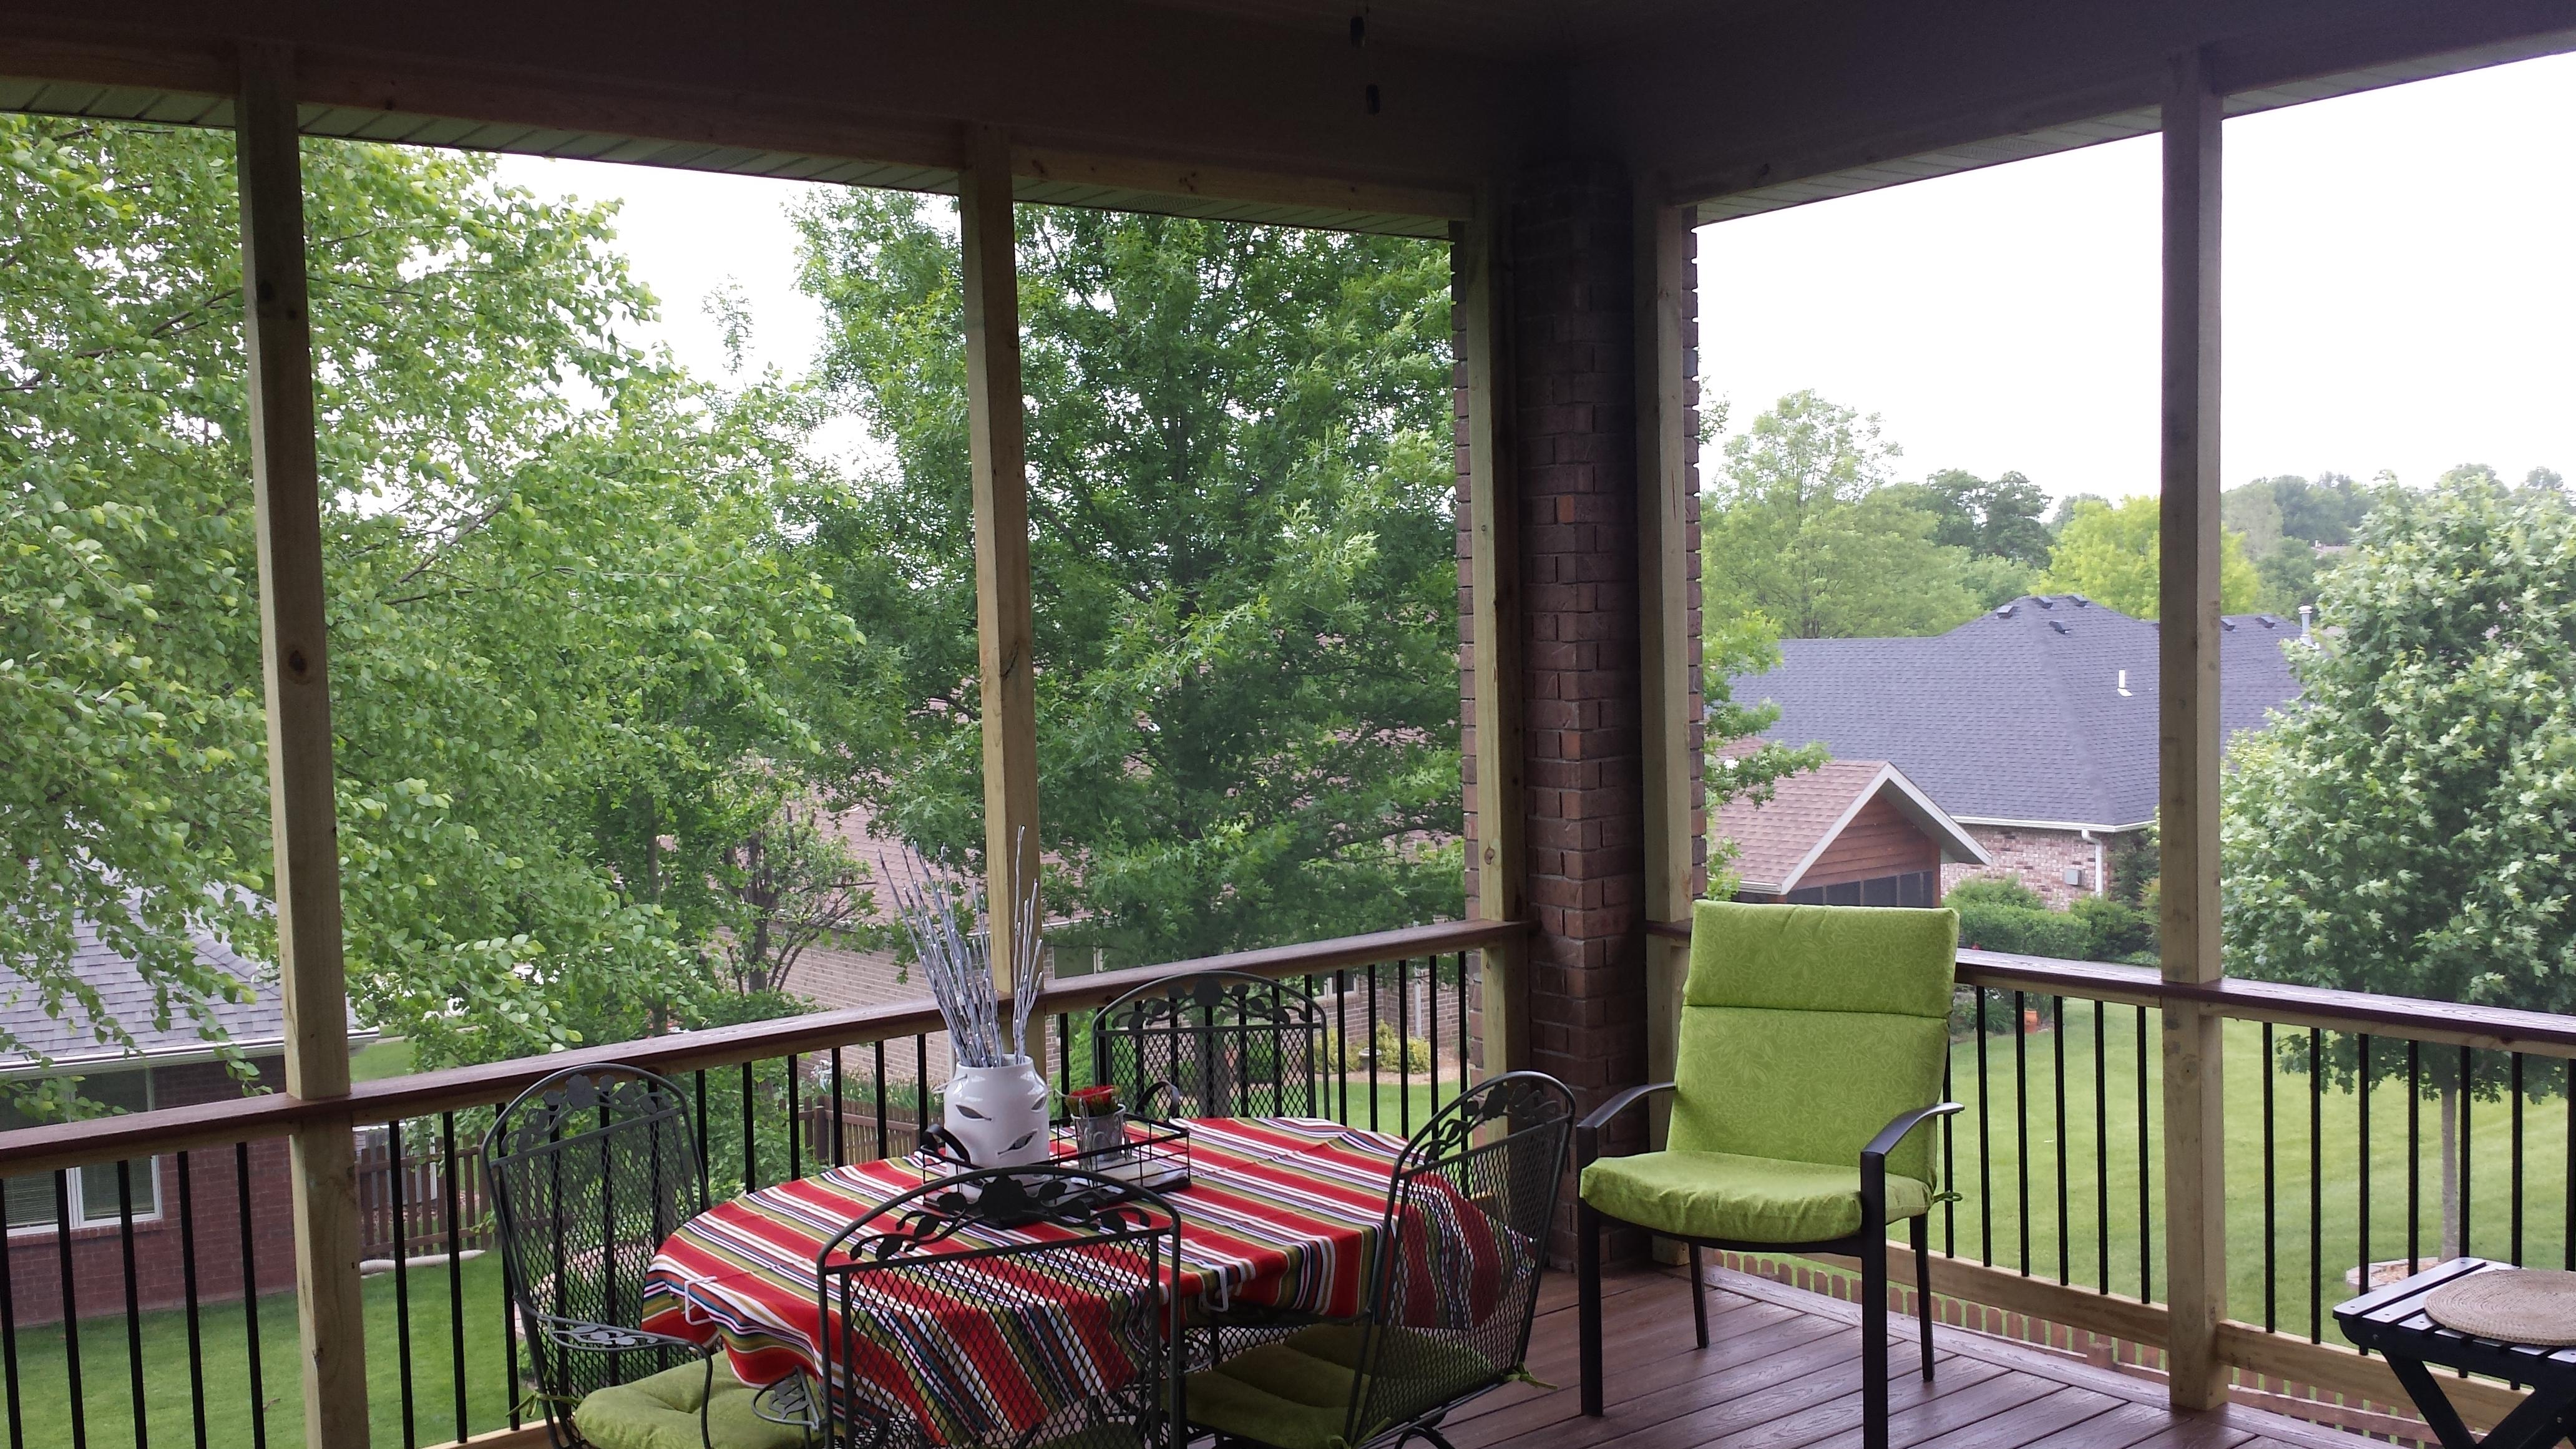 Inside the upper deck porch